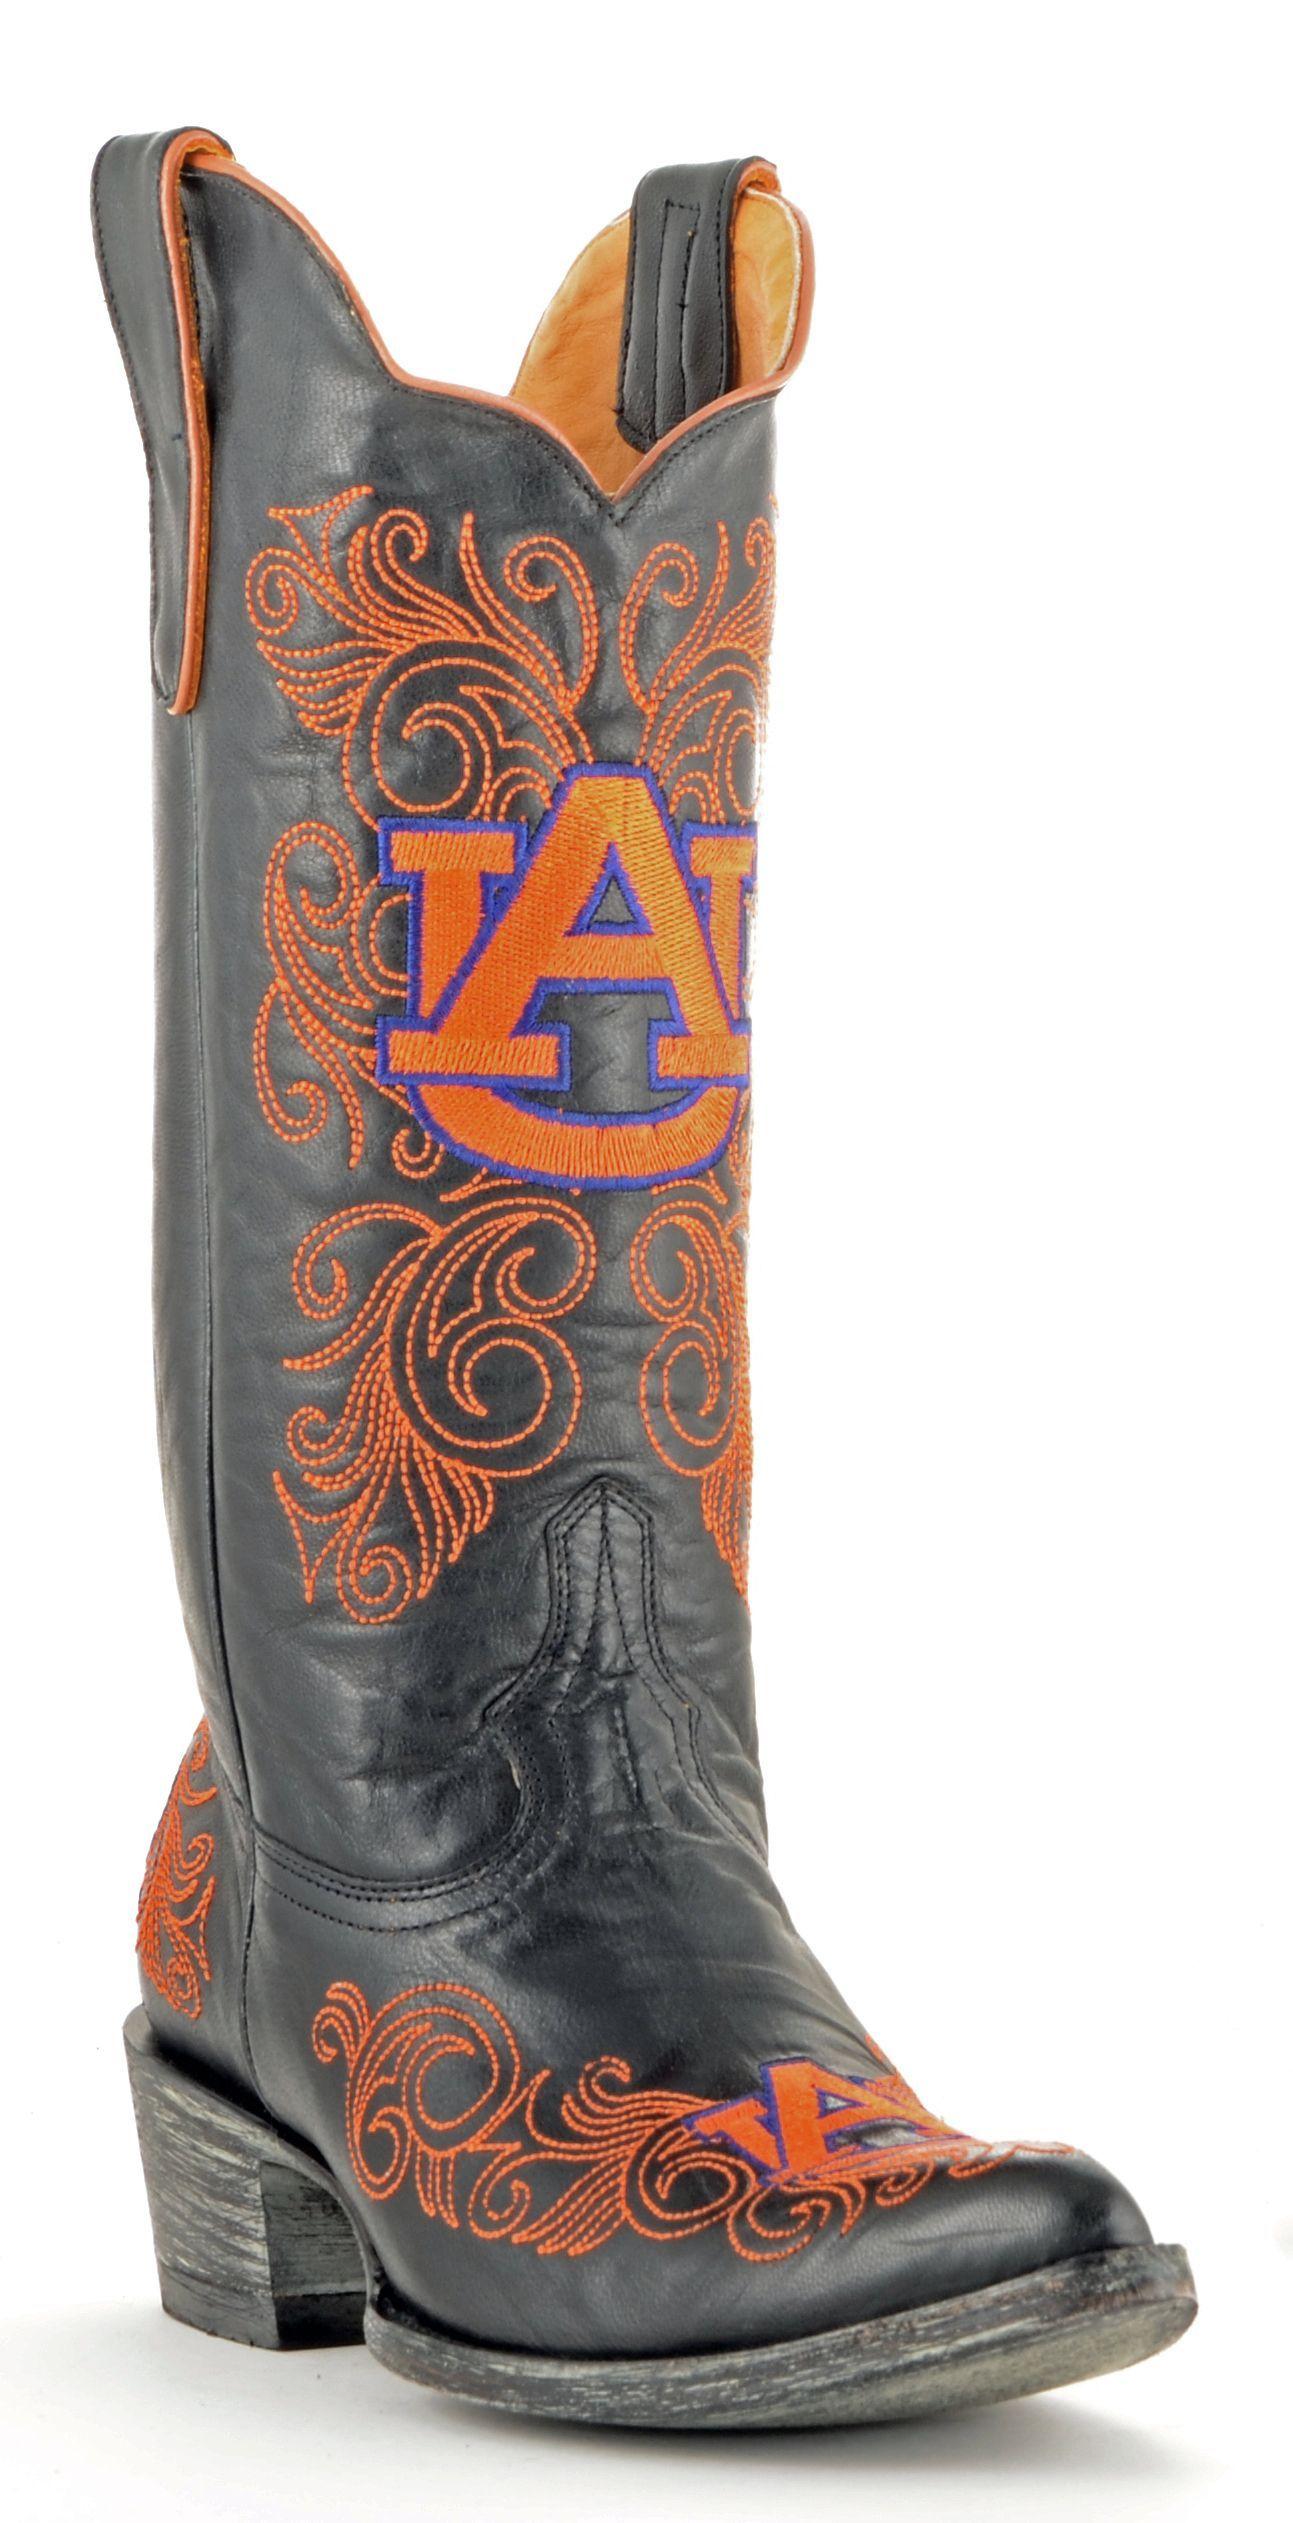 a33c922d304 Womens Auburn boots   Auburn   Cowboy boots women, Black leather ...